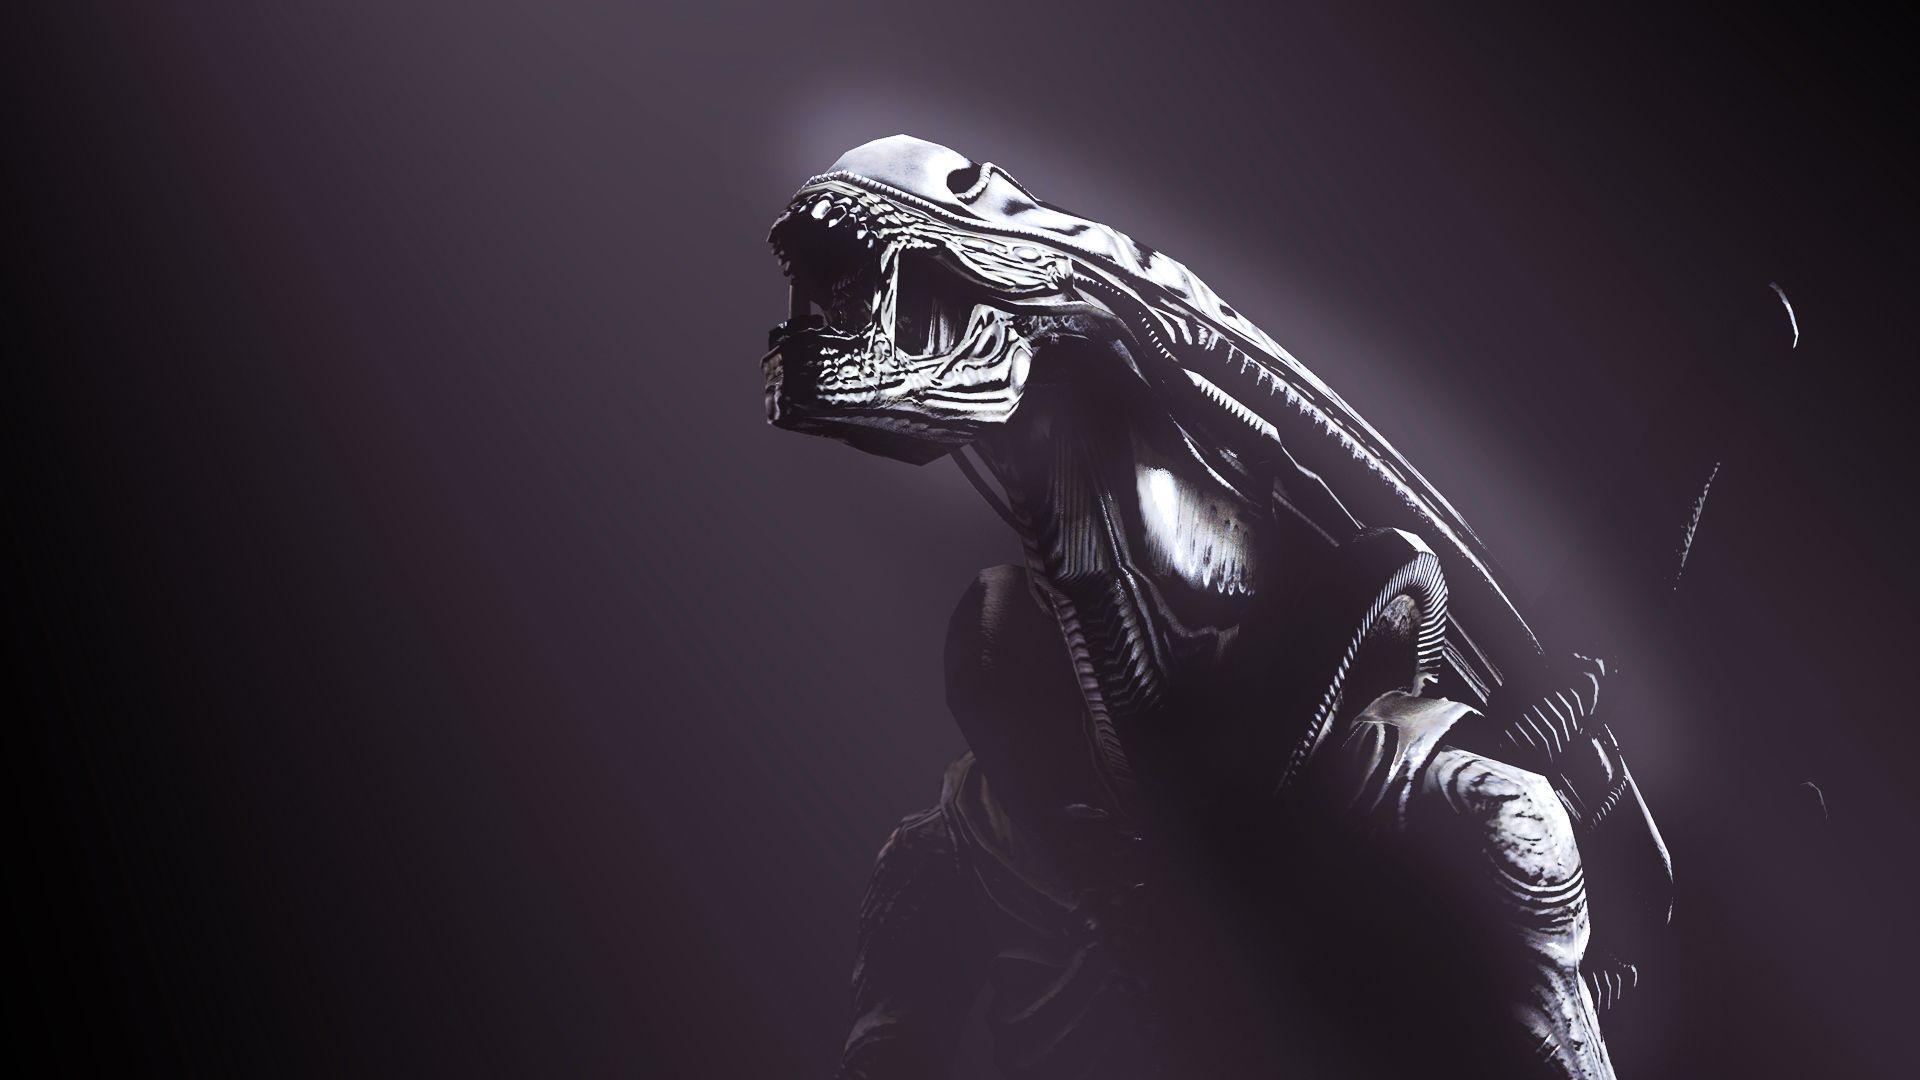 Xenomorph Wallpaper, Prometheus, Aliens Space